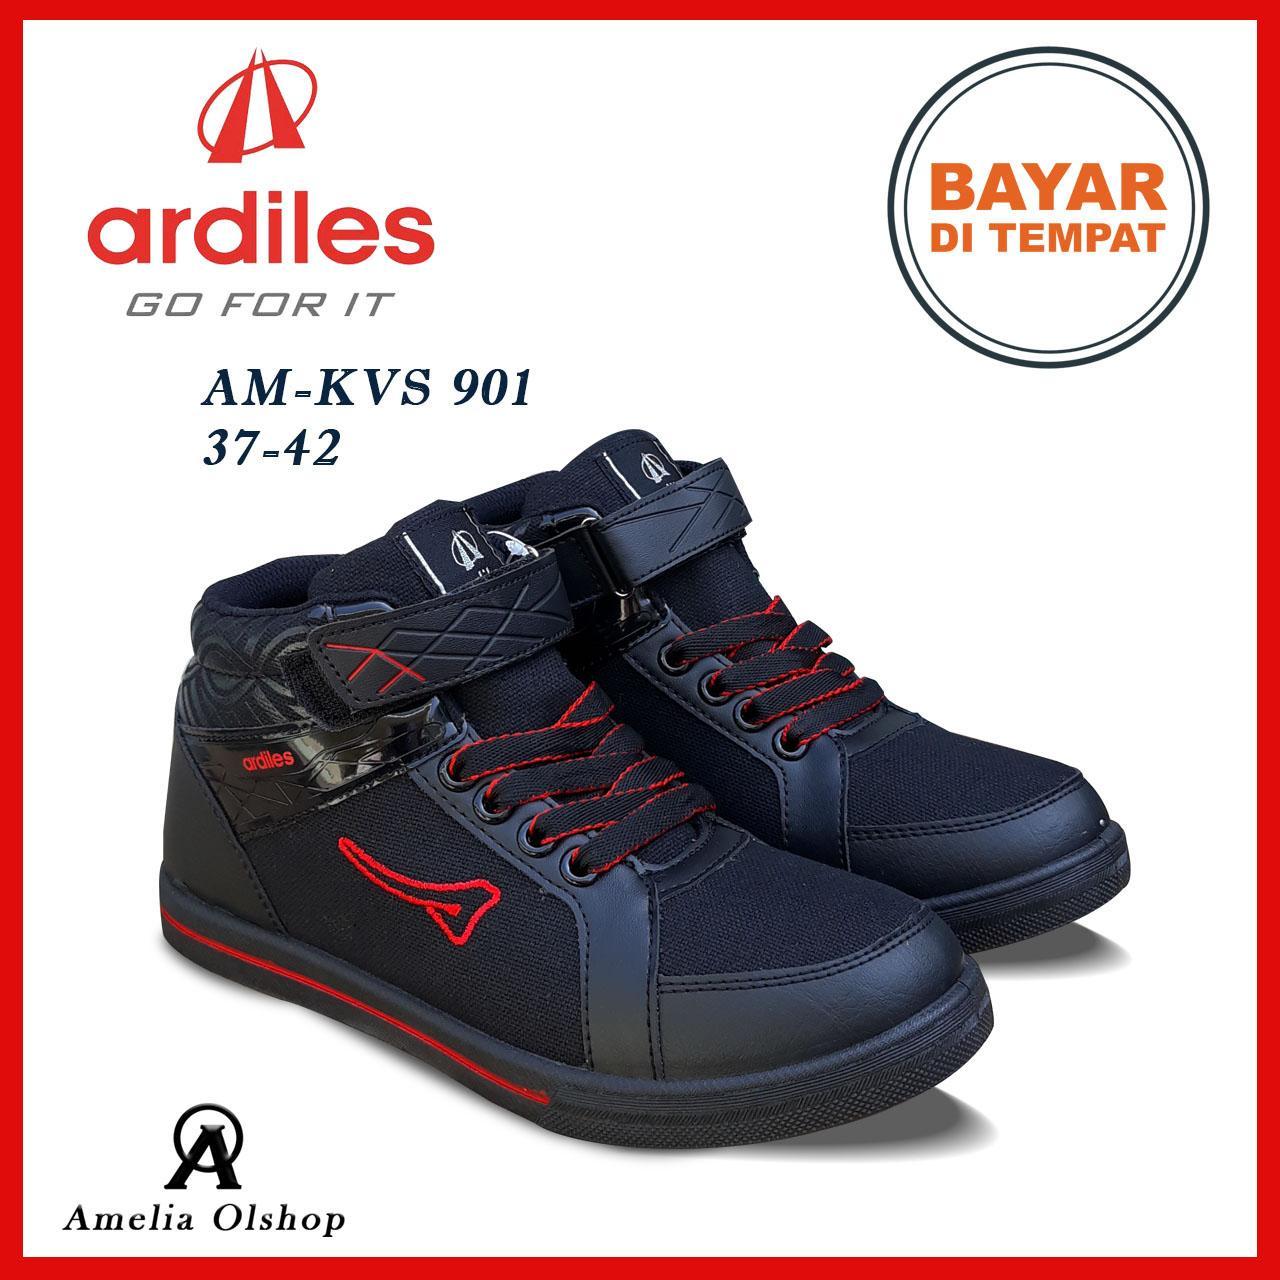 Amelia Olshop - Ardiles Sepatu Sekolah Jaman Now AM-KVS-901